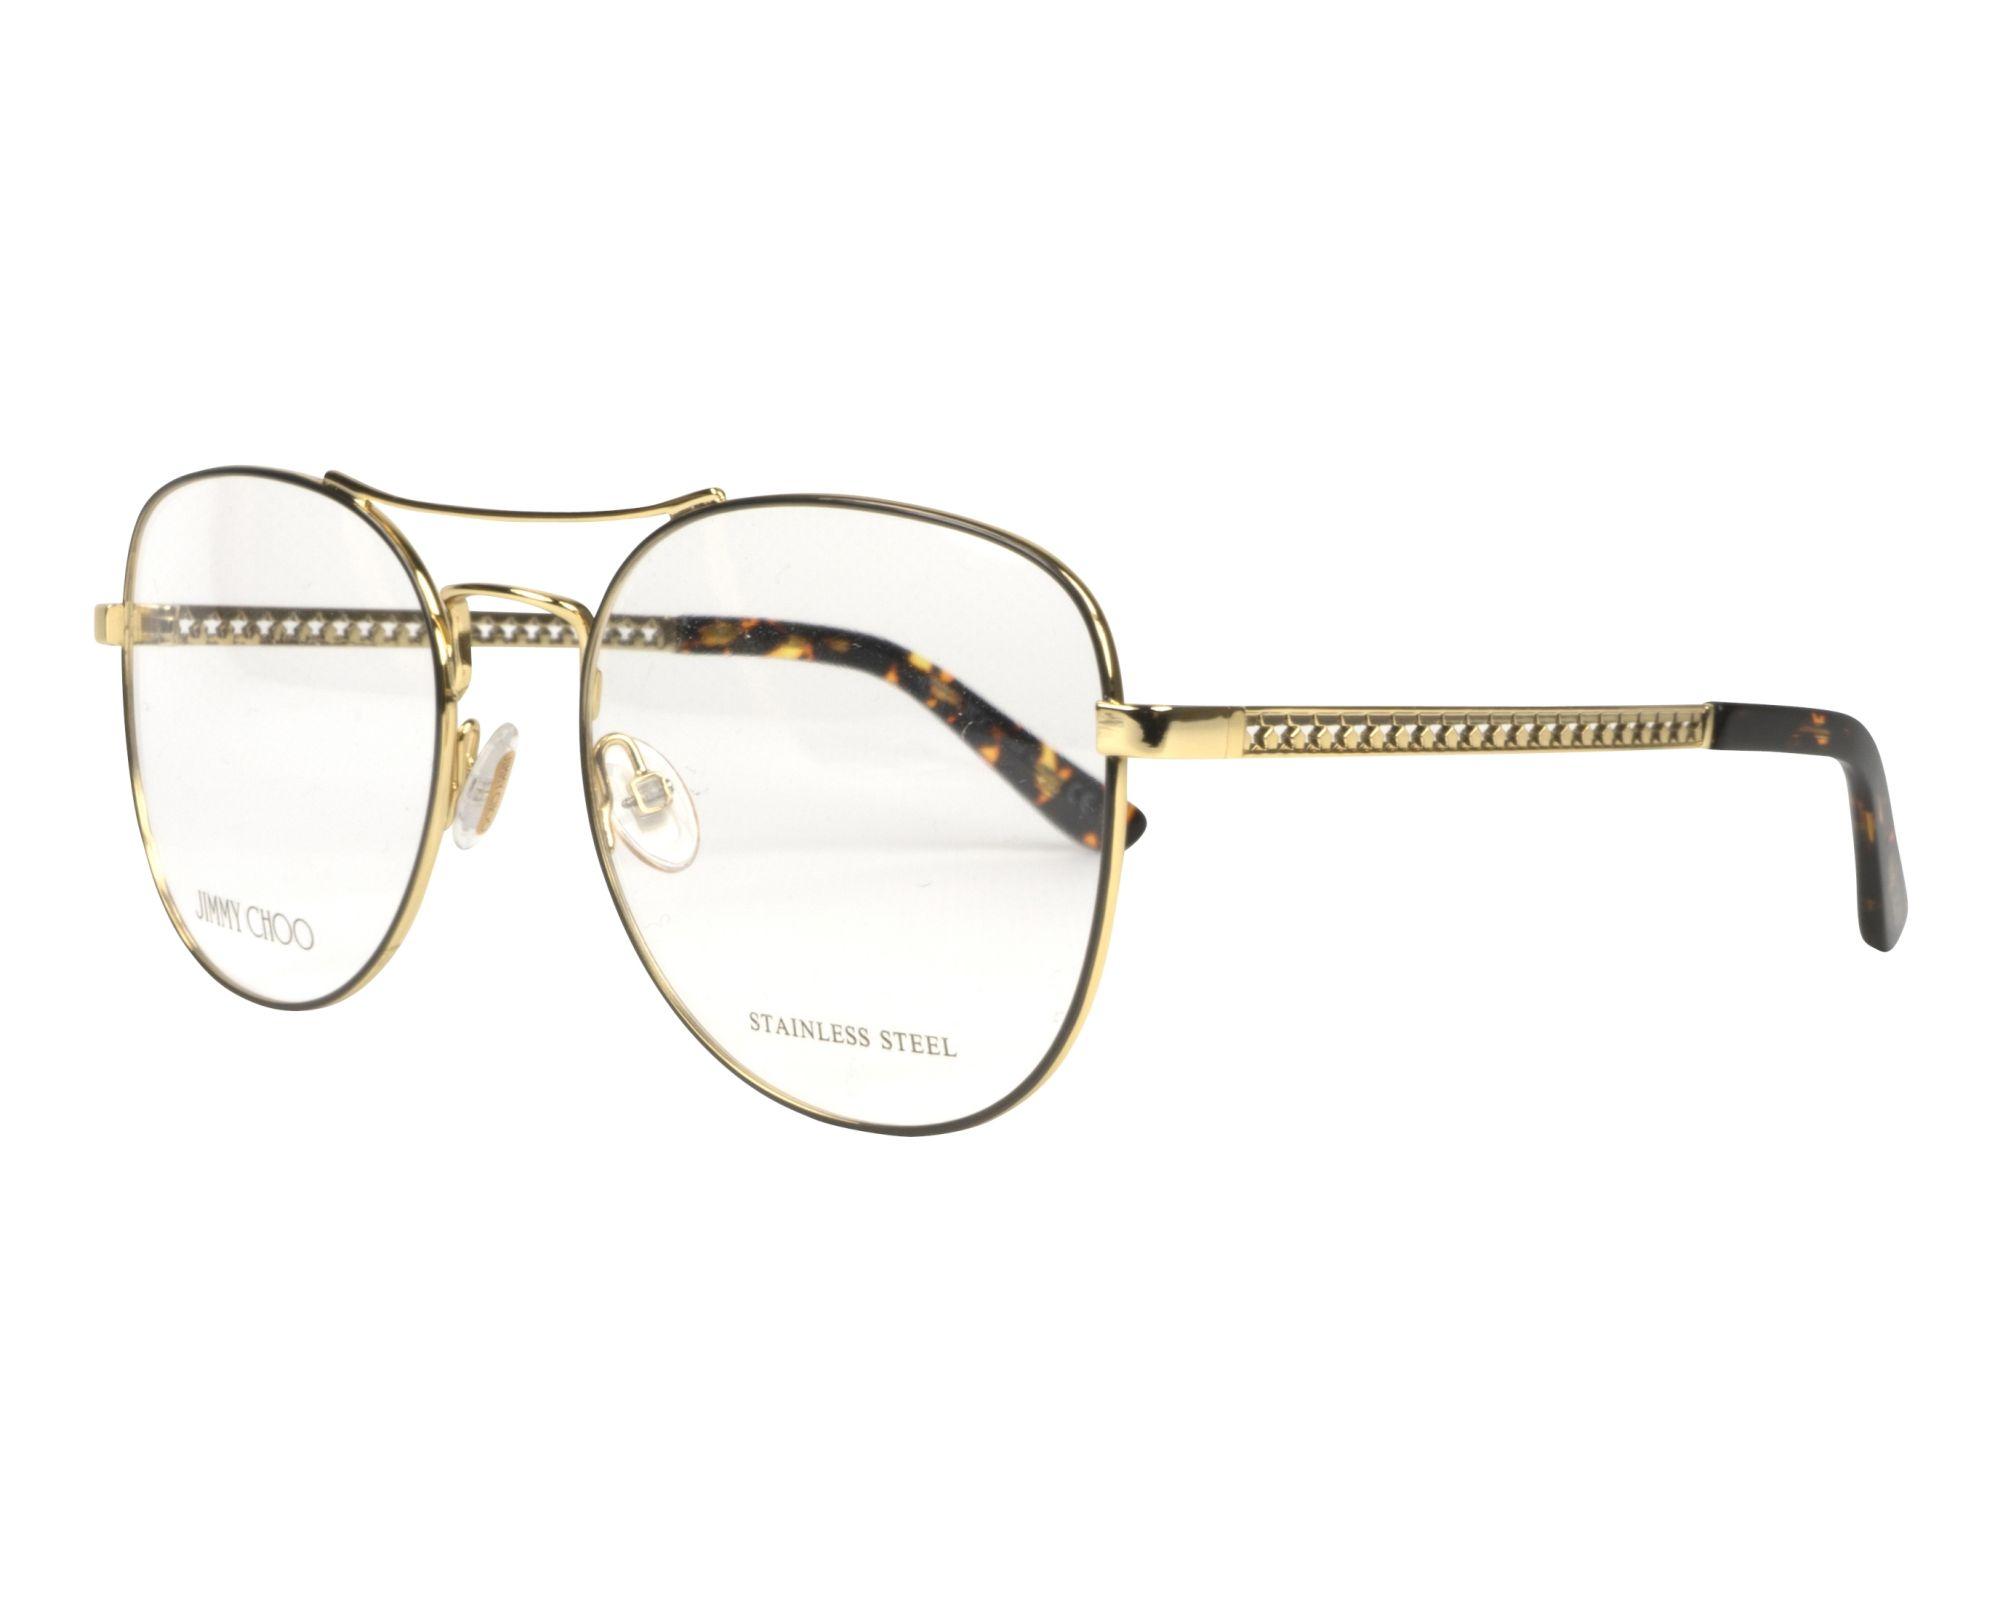 8d313517d343 Eyeglasses jimmy choo vue gold grey profile view jpg 2000x1600 Jimmy choo  eyewear